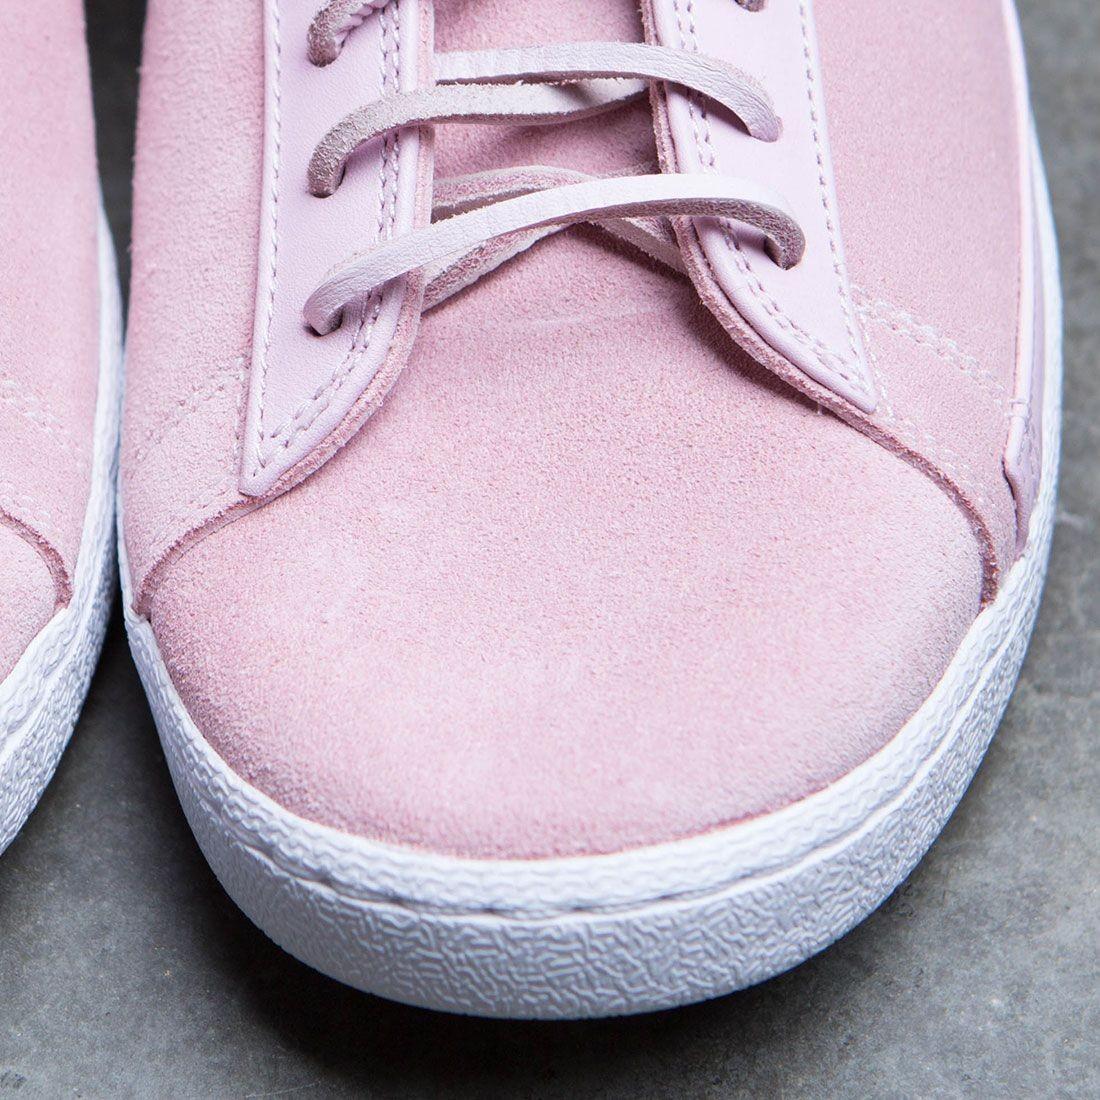 NikeLab Men Blazer Low Cs Tc Tech Craft (prism pink   whtie) 47c2c35907